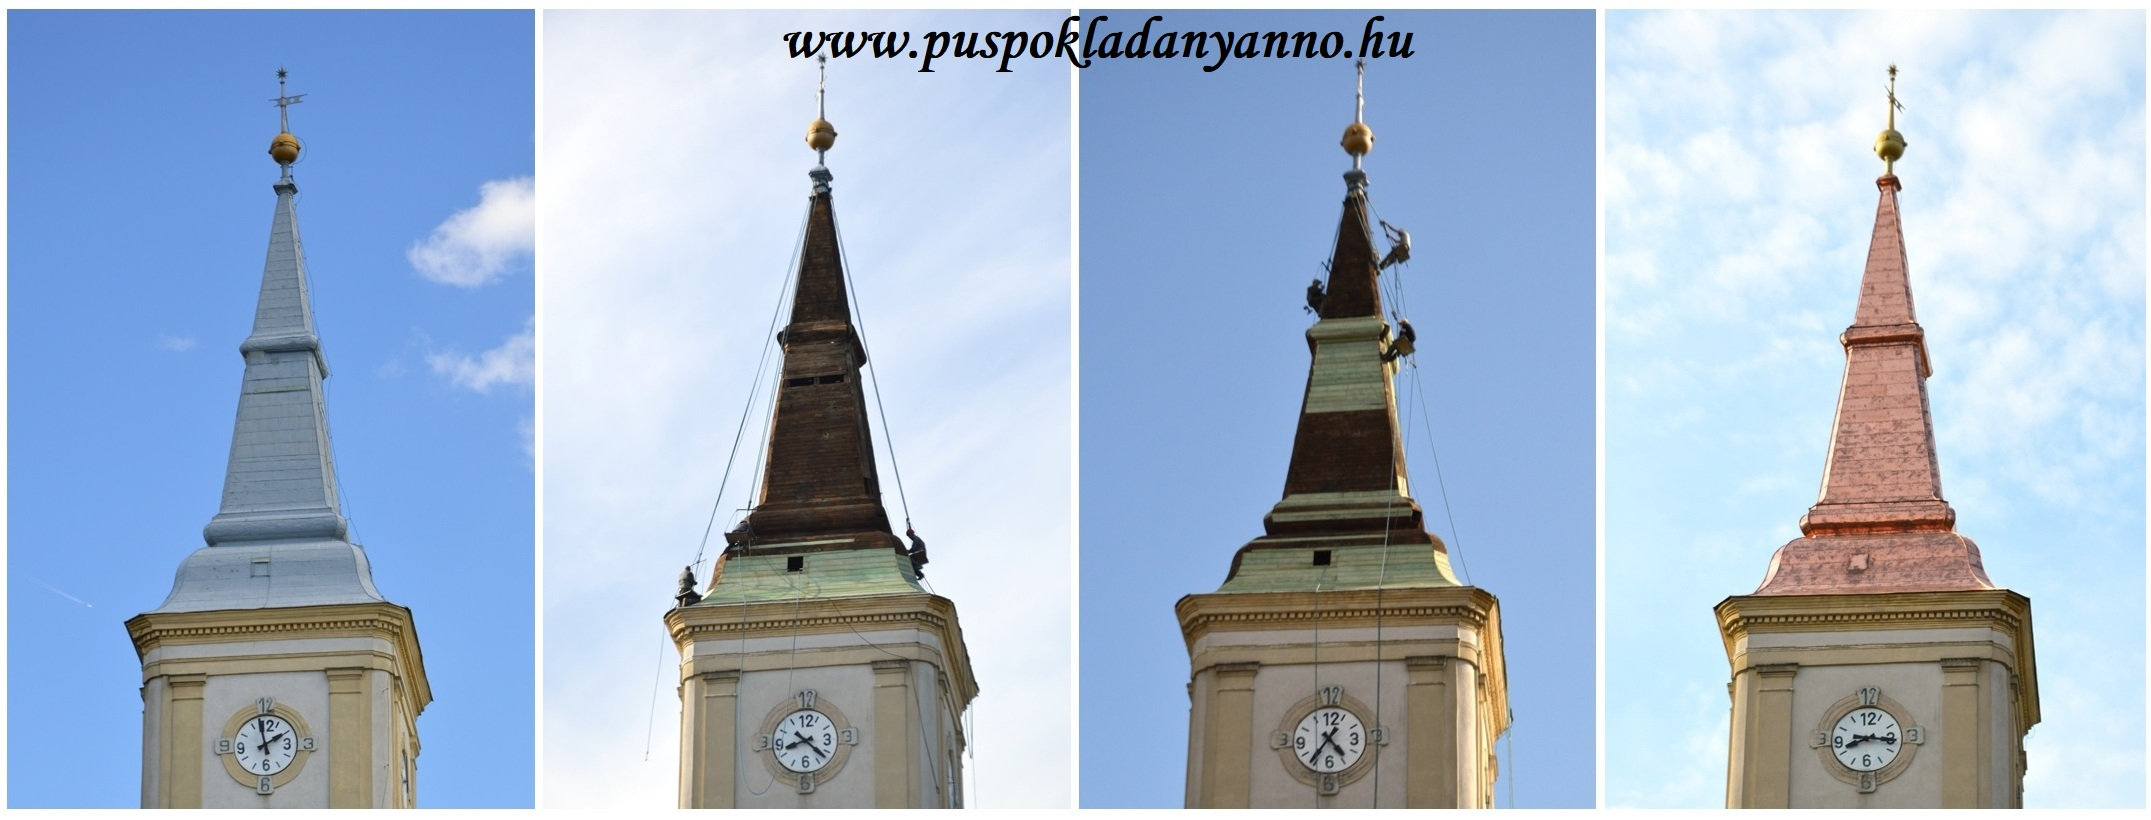 templom három csúcs)